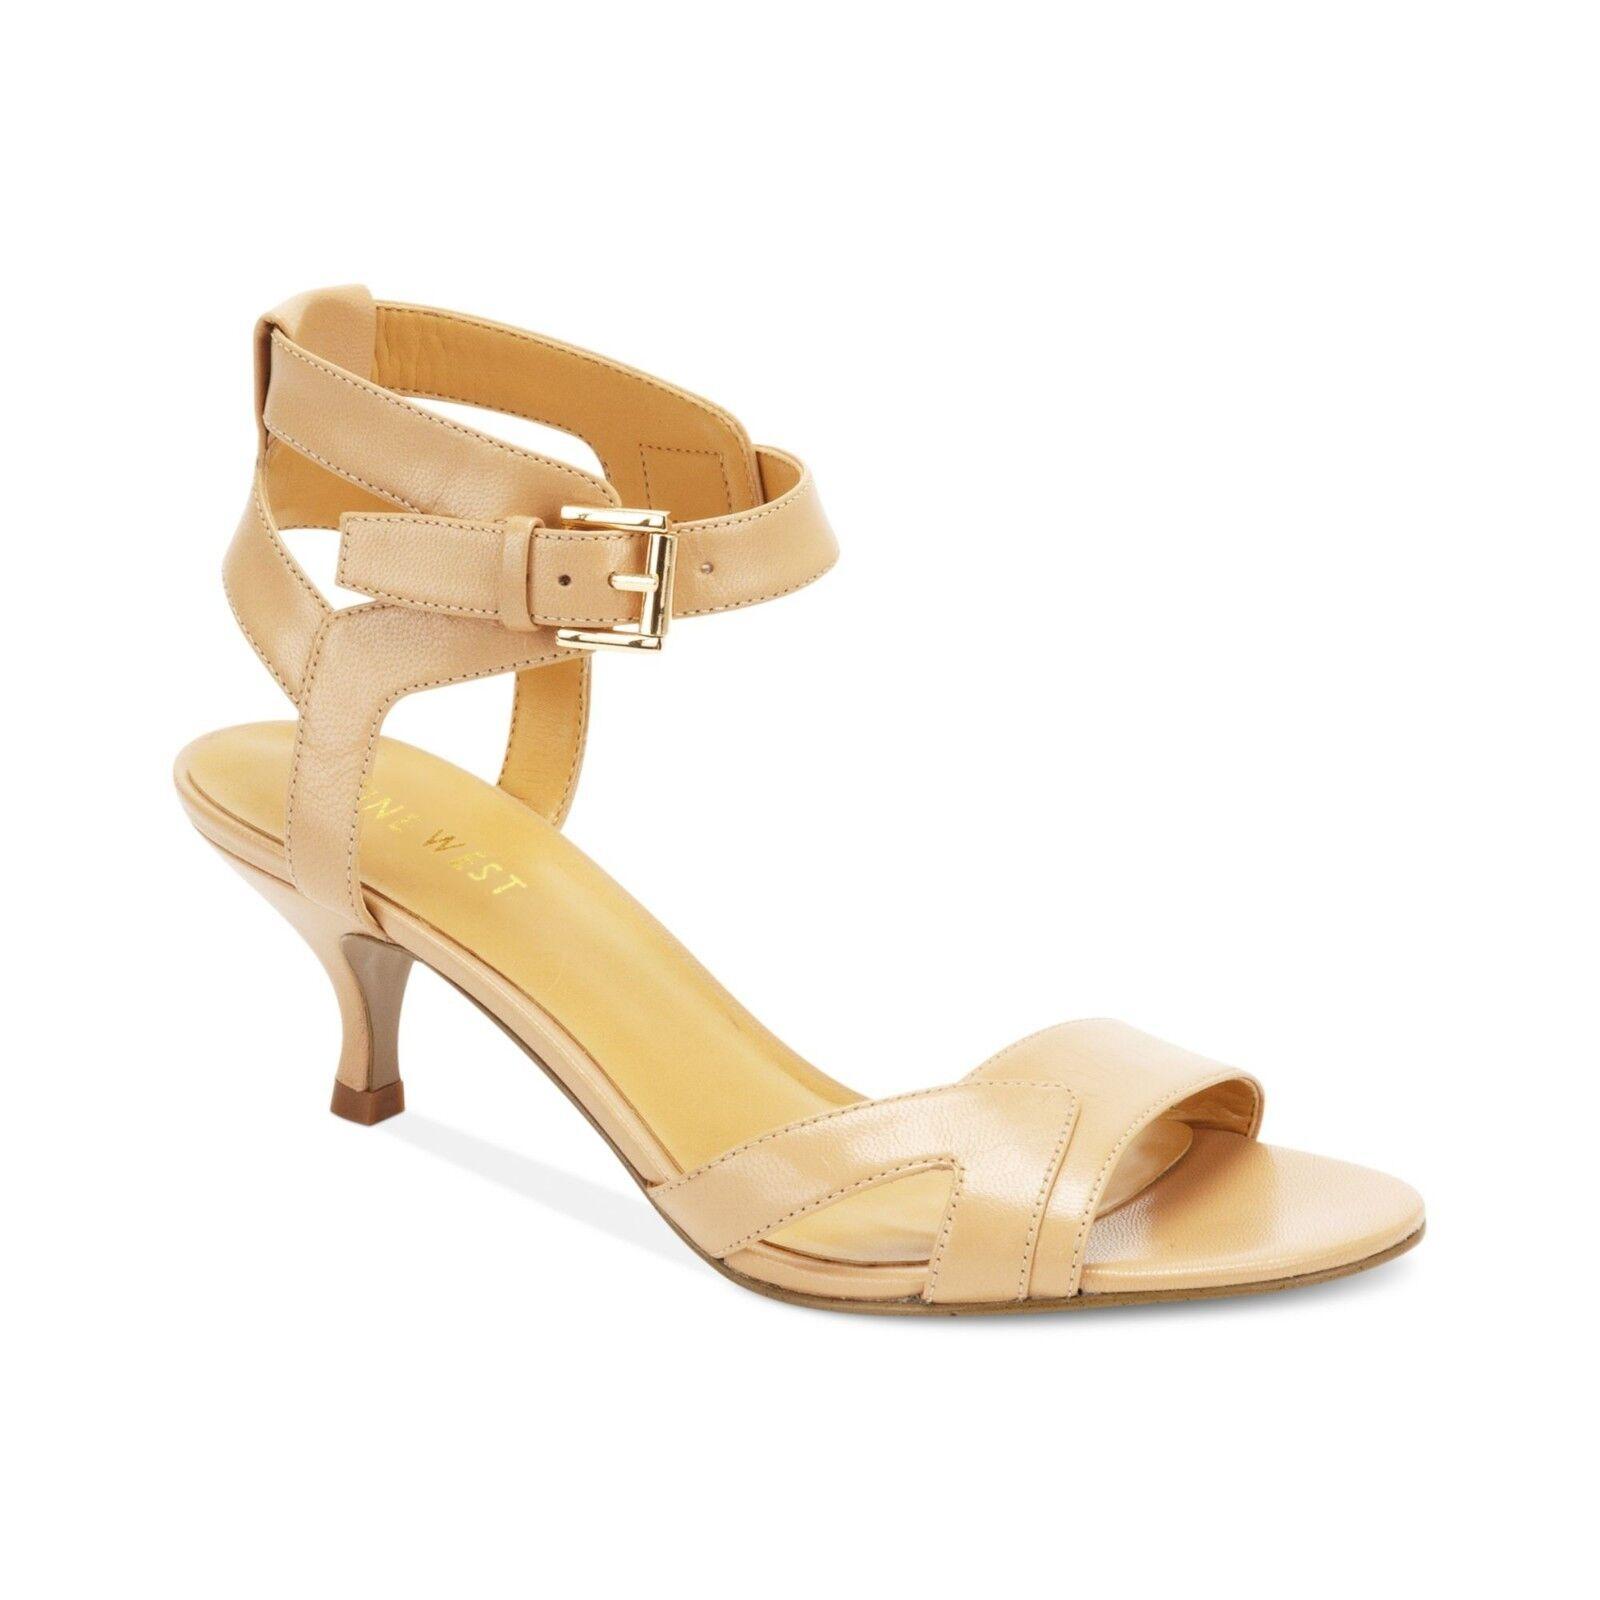 Ladies NINE WEST Low-Heeled Round Opened Toe Natural Sandal shoesBRAND NEWRARE